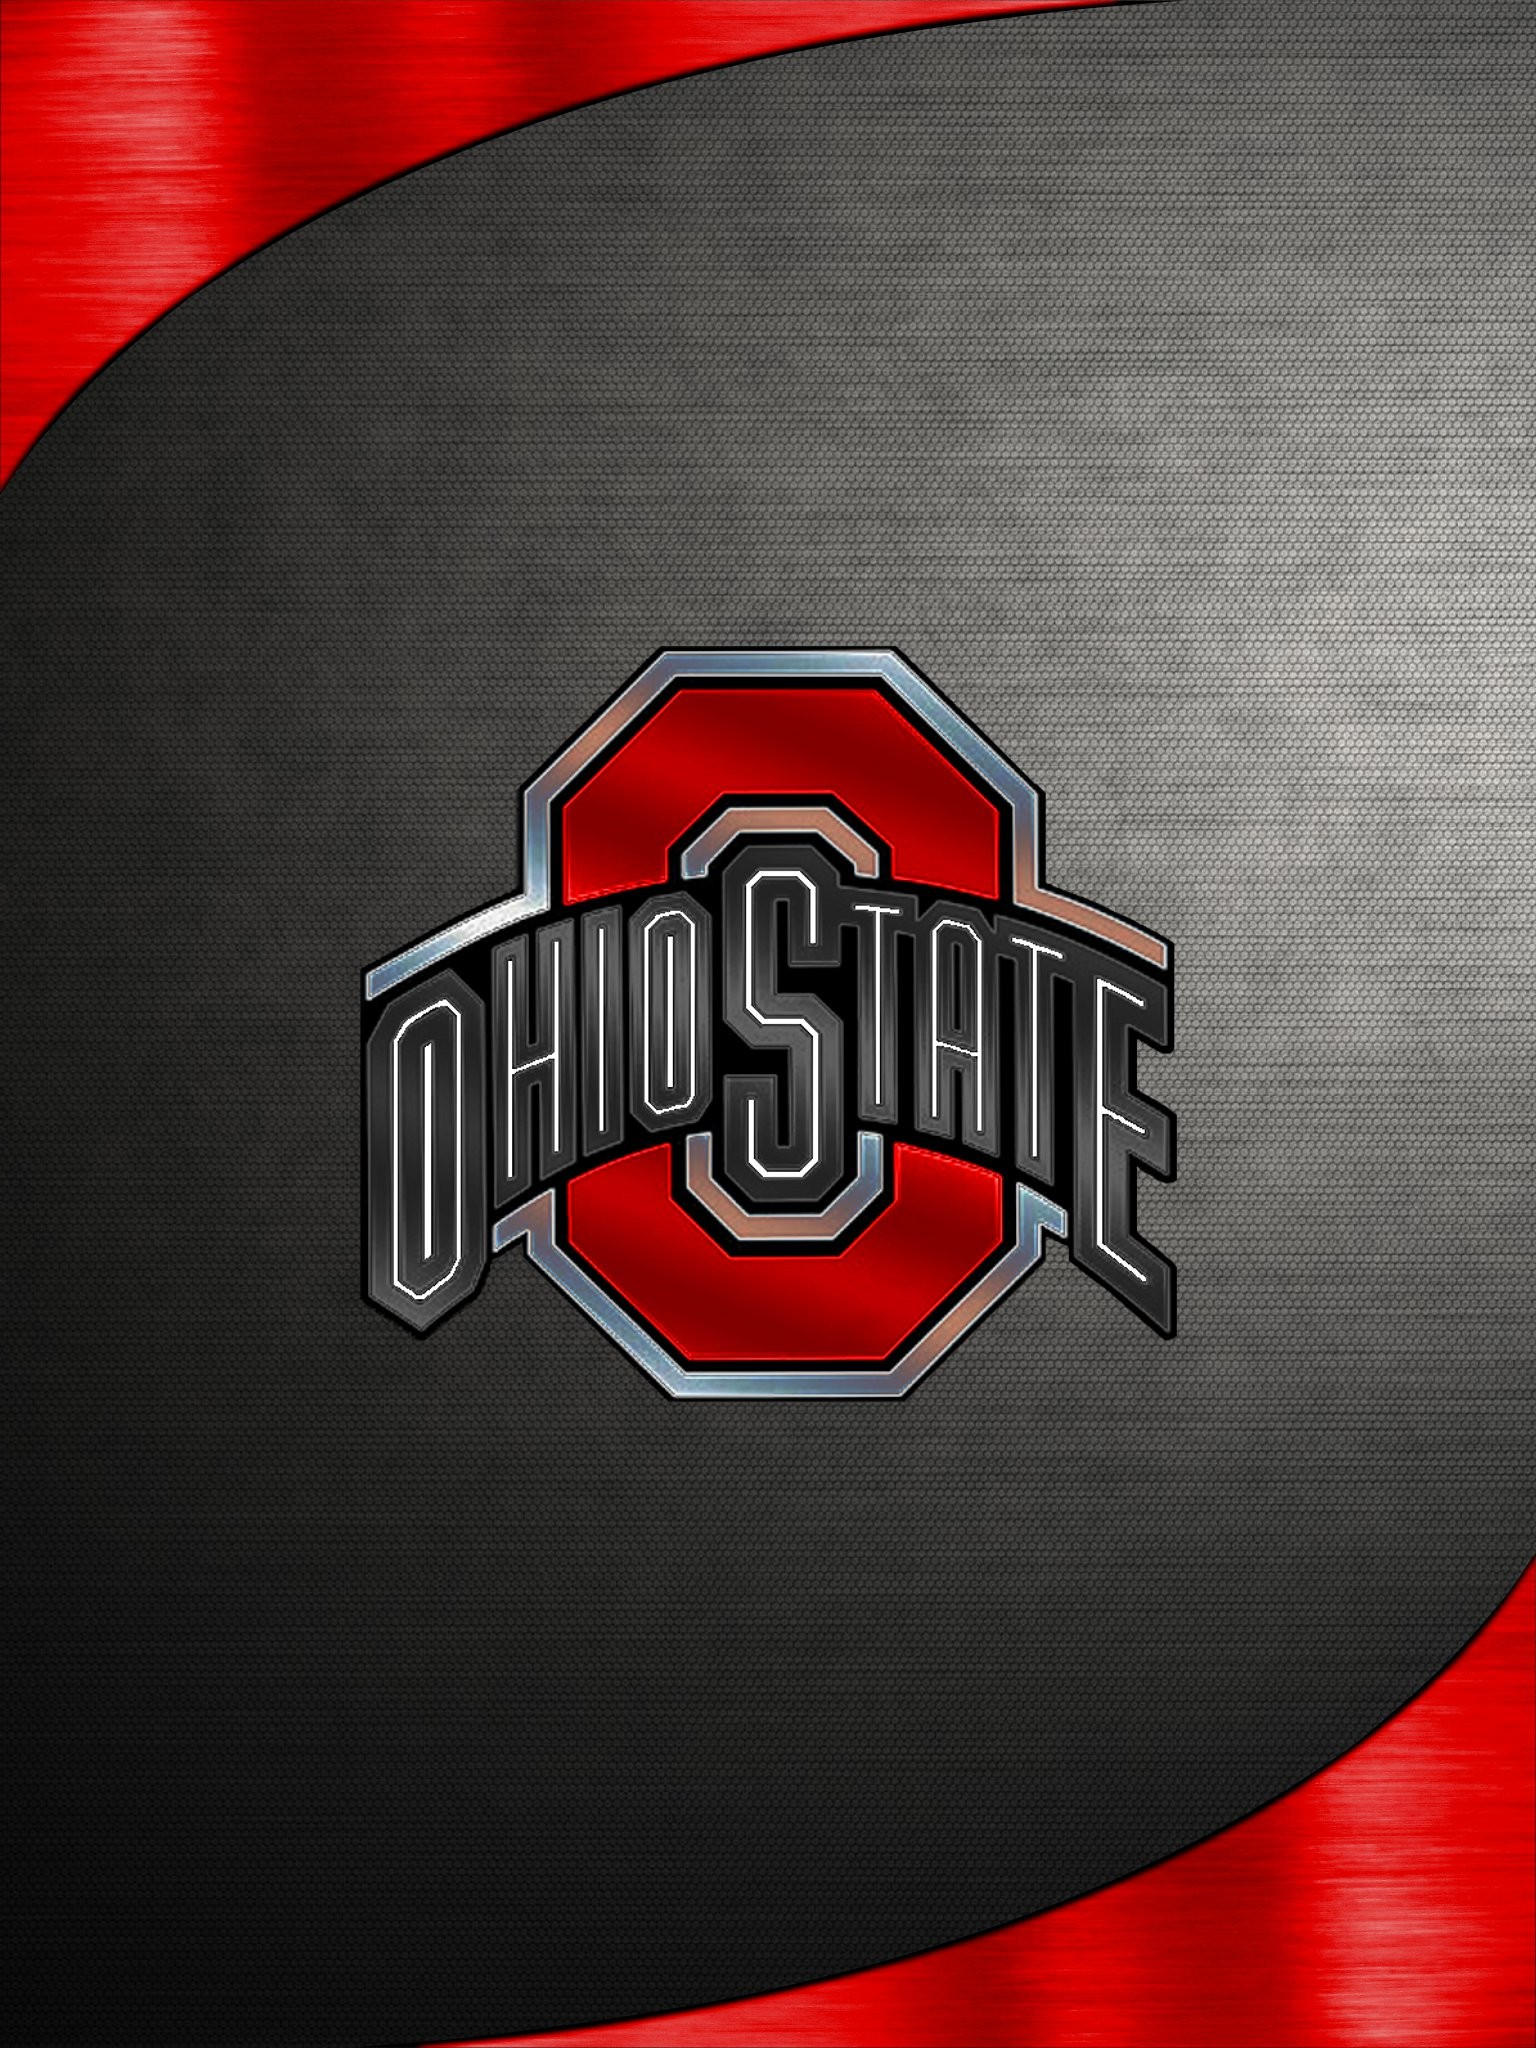 OSU Wallpaper 532 | OHIO STATE DESKTOP WALLPAPERS | Pinterest | Wallpaper,  Ohio and Buckeyes